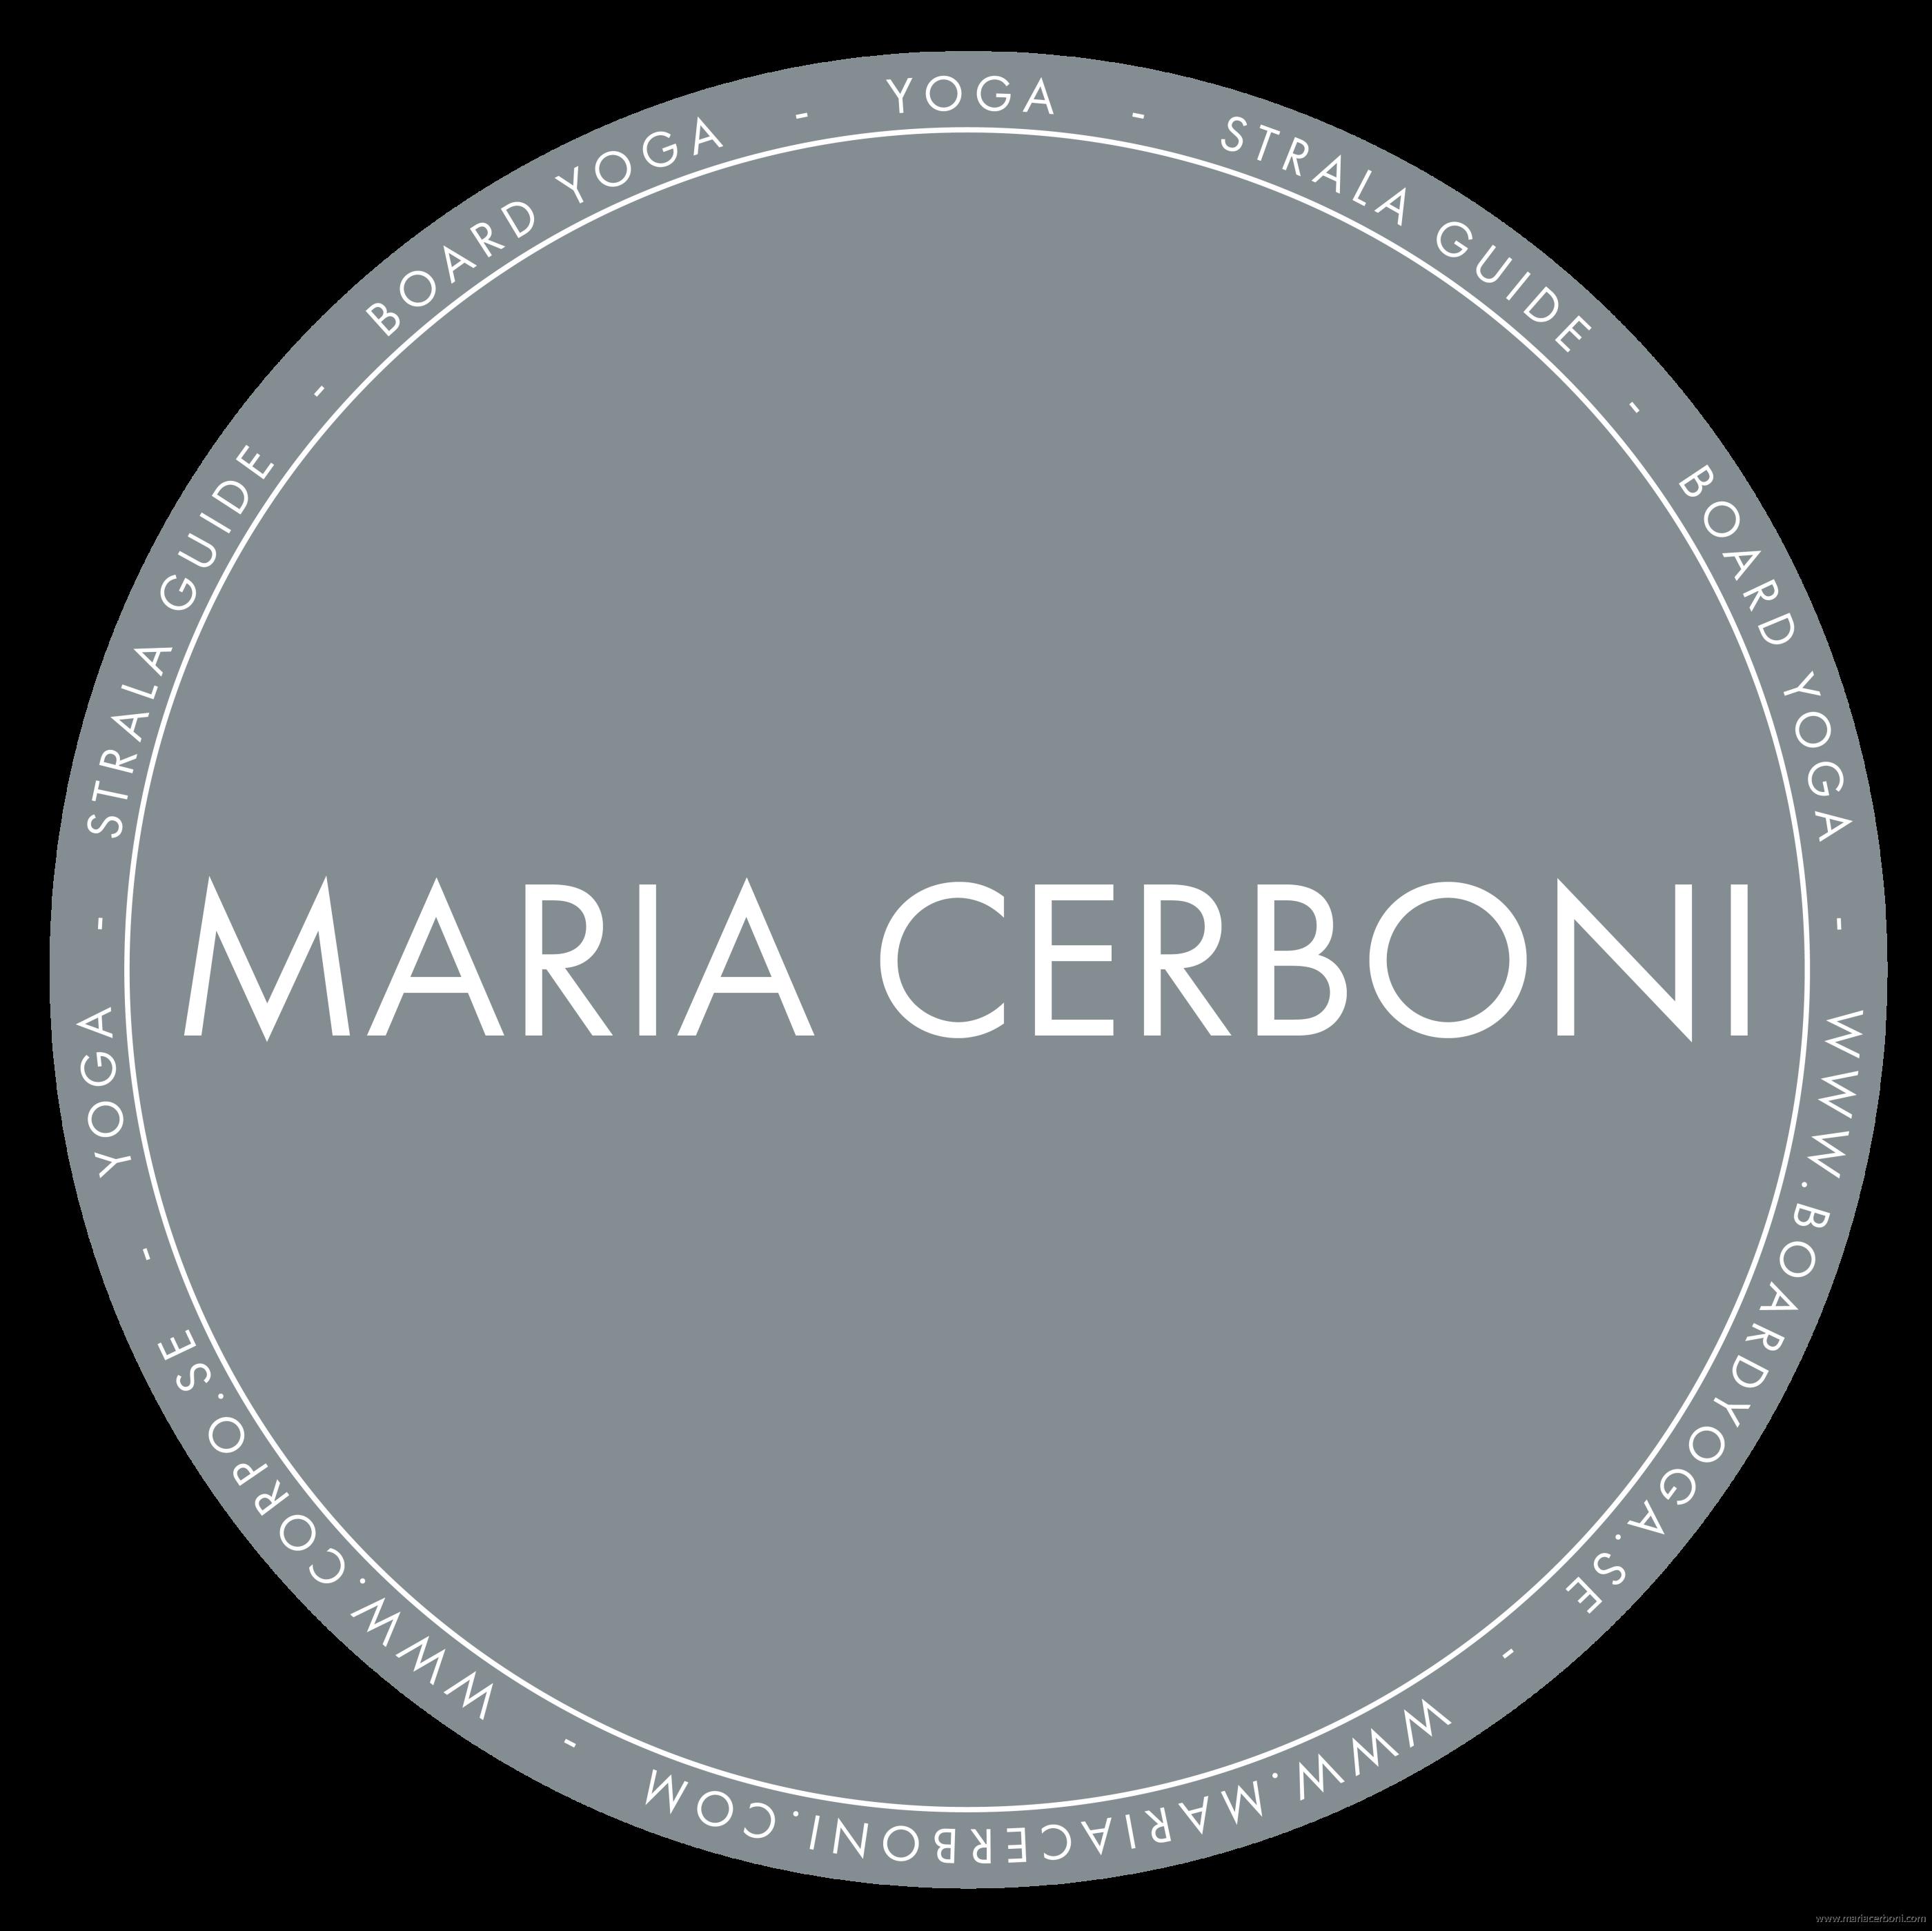 MARIA CERBONI _ A _ LOGGOR SKISS 2017 08 21 _ VALD 2 MÖRKARE